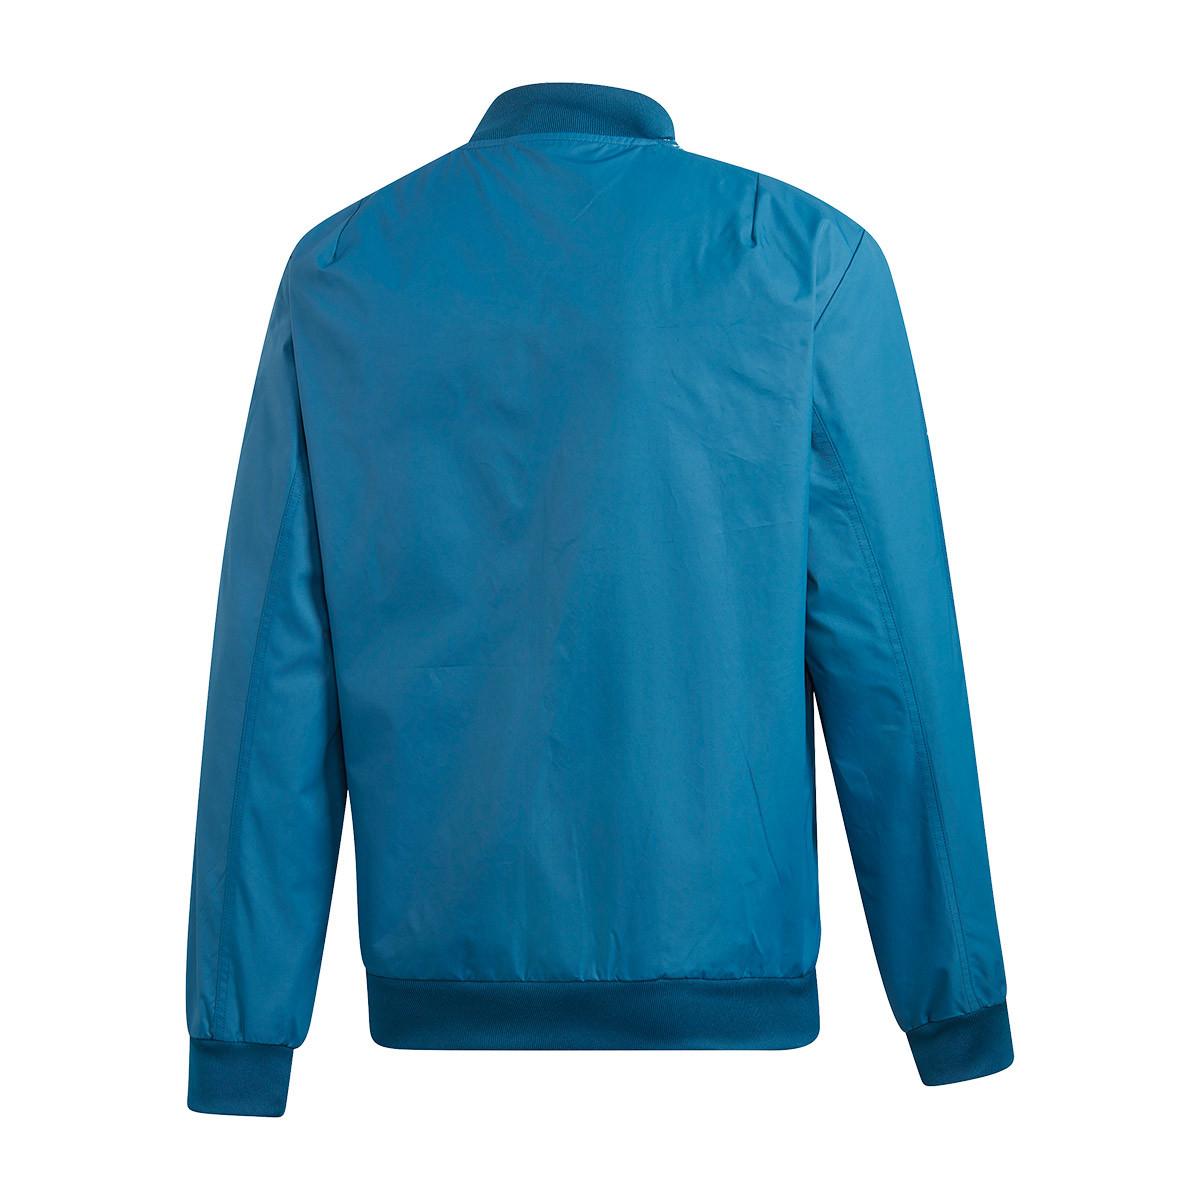 44f594d1fa0c Jacket adidas Argentina Anthem 2019 Blue night-Light aqua - Football ...